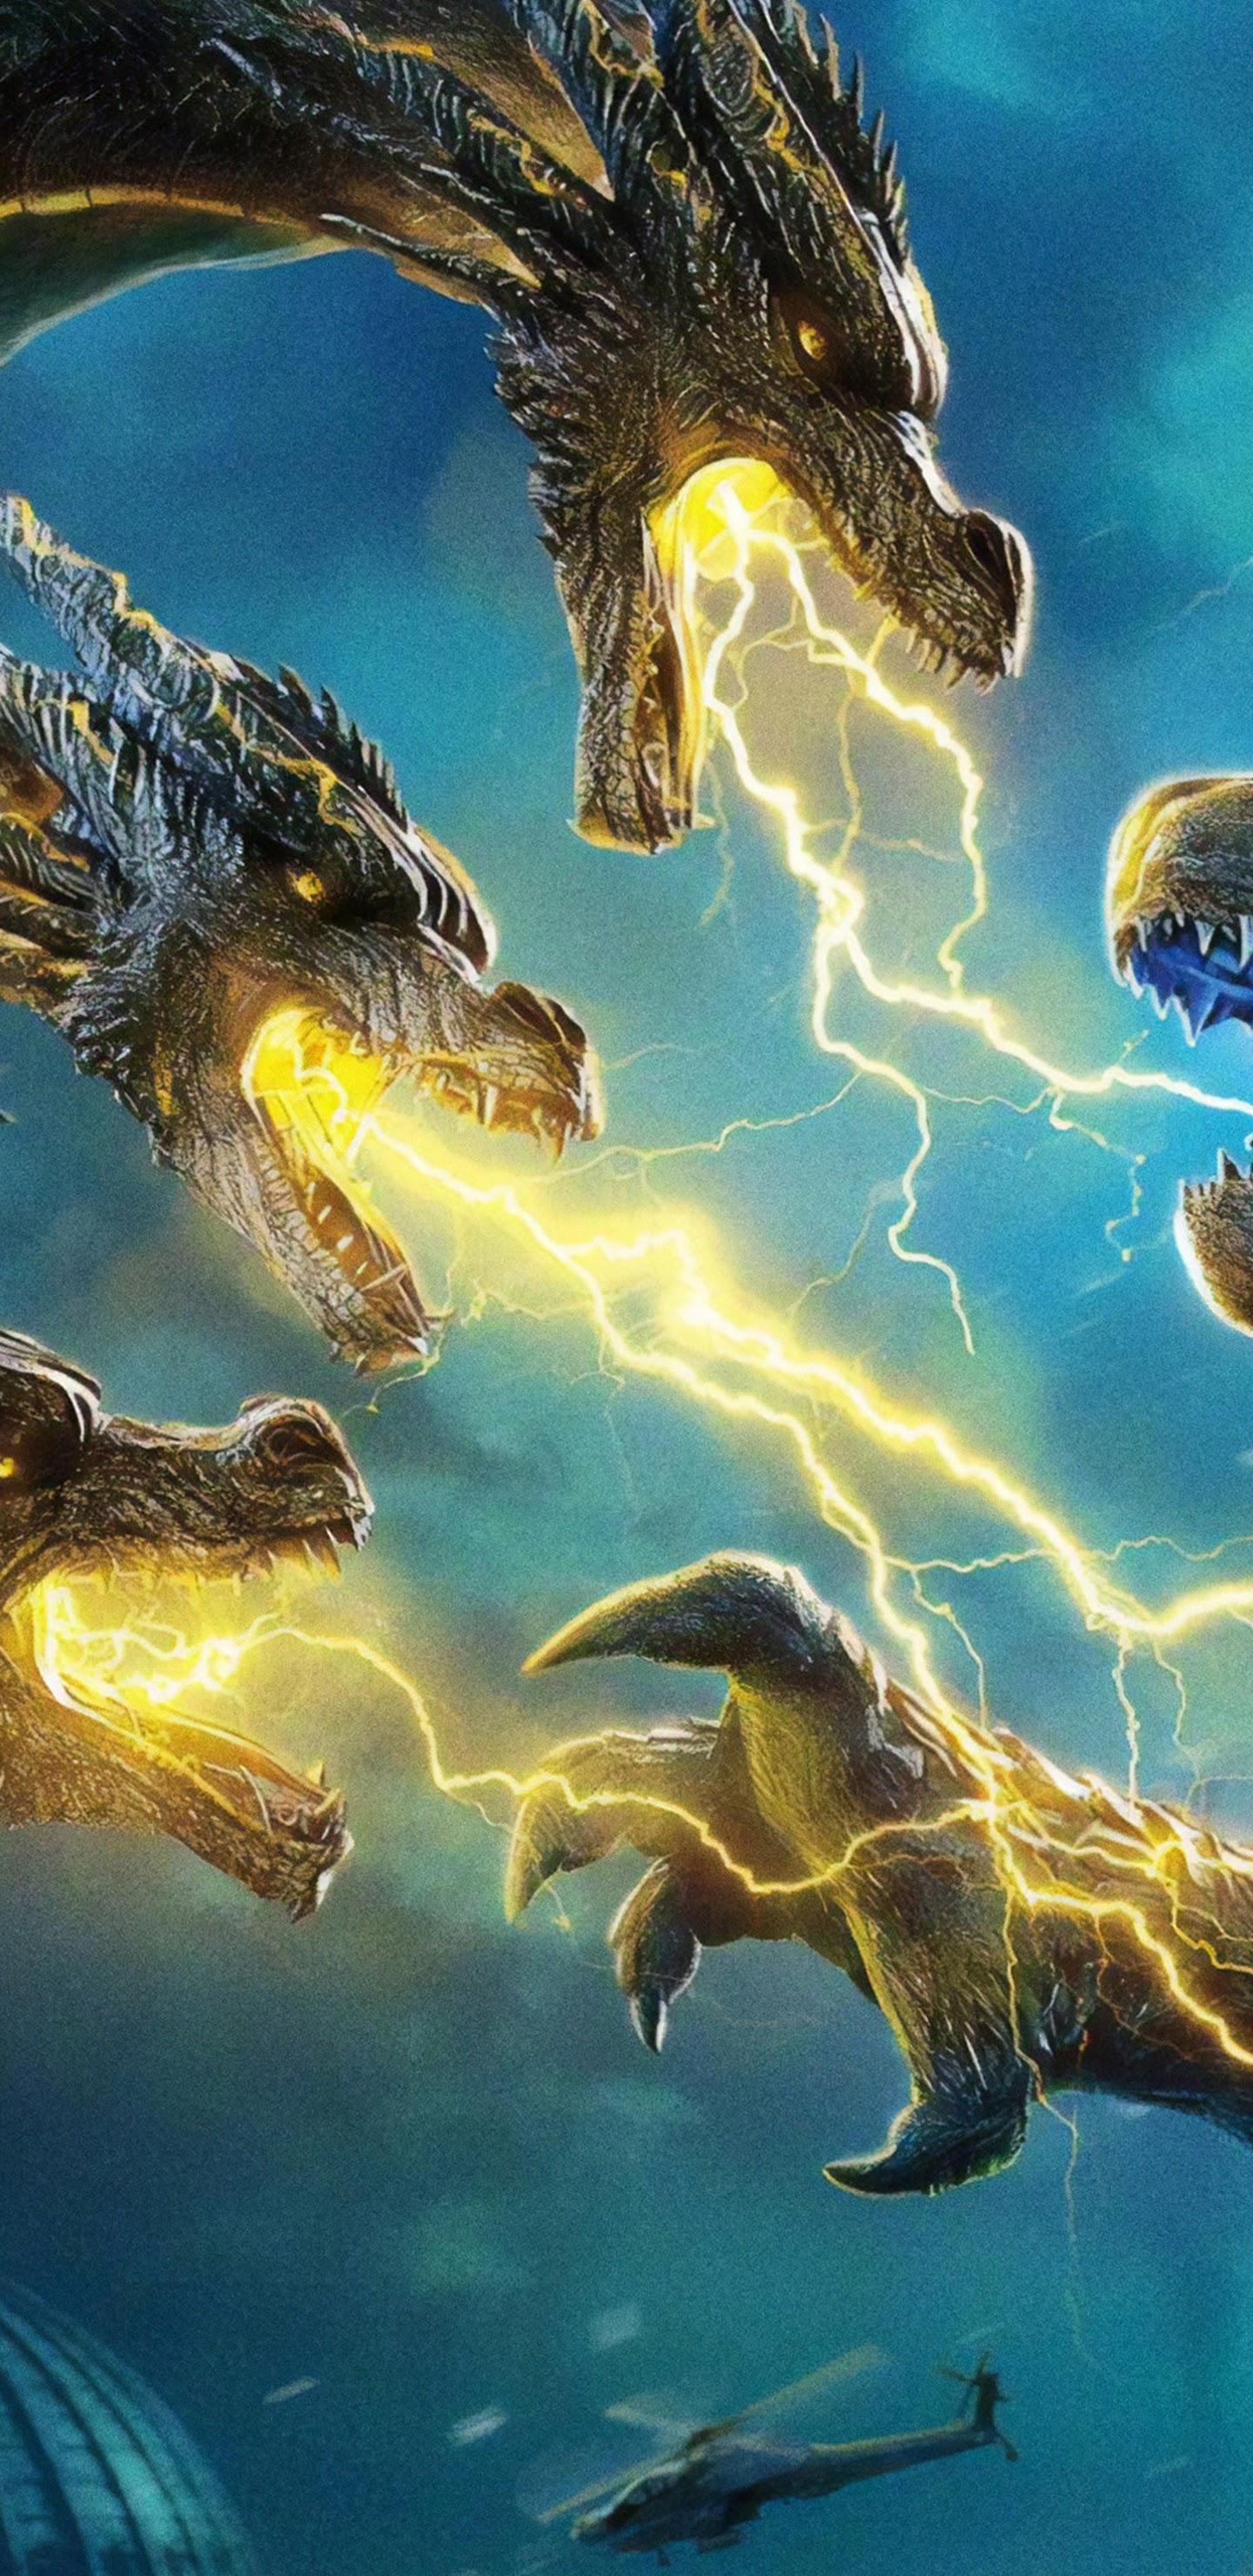 Godzilla Vs King Ghidorah King Of The Monsters 4k Wallpaper 11